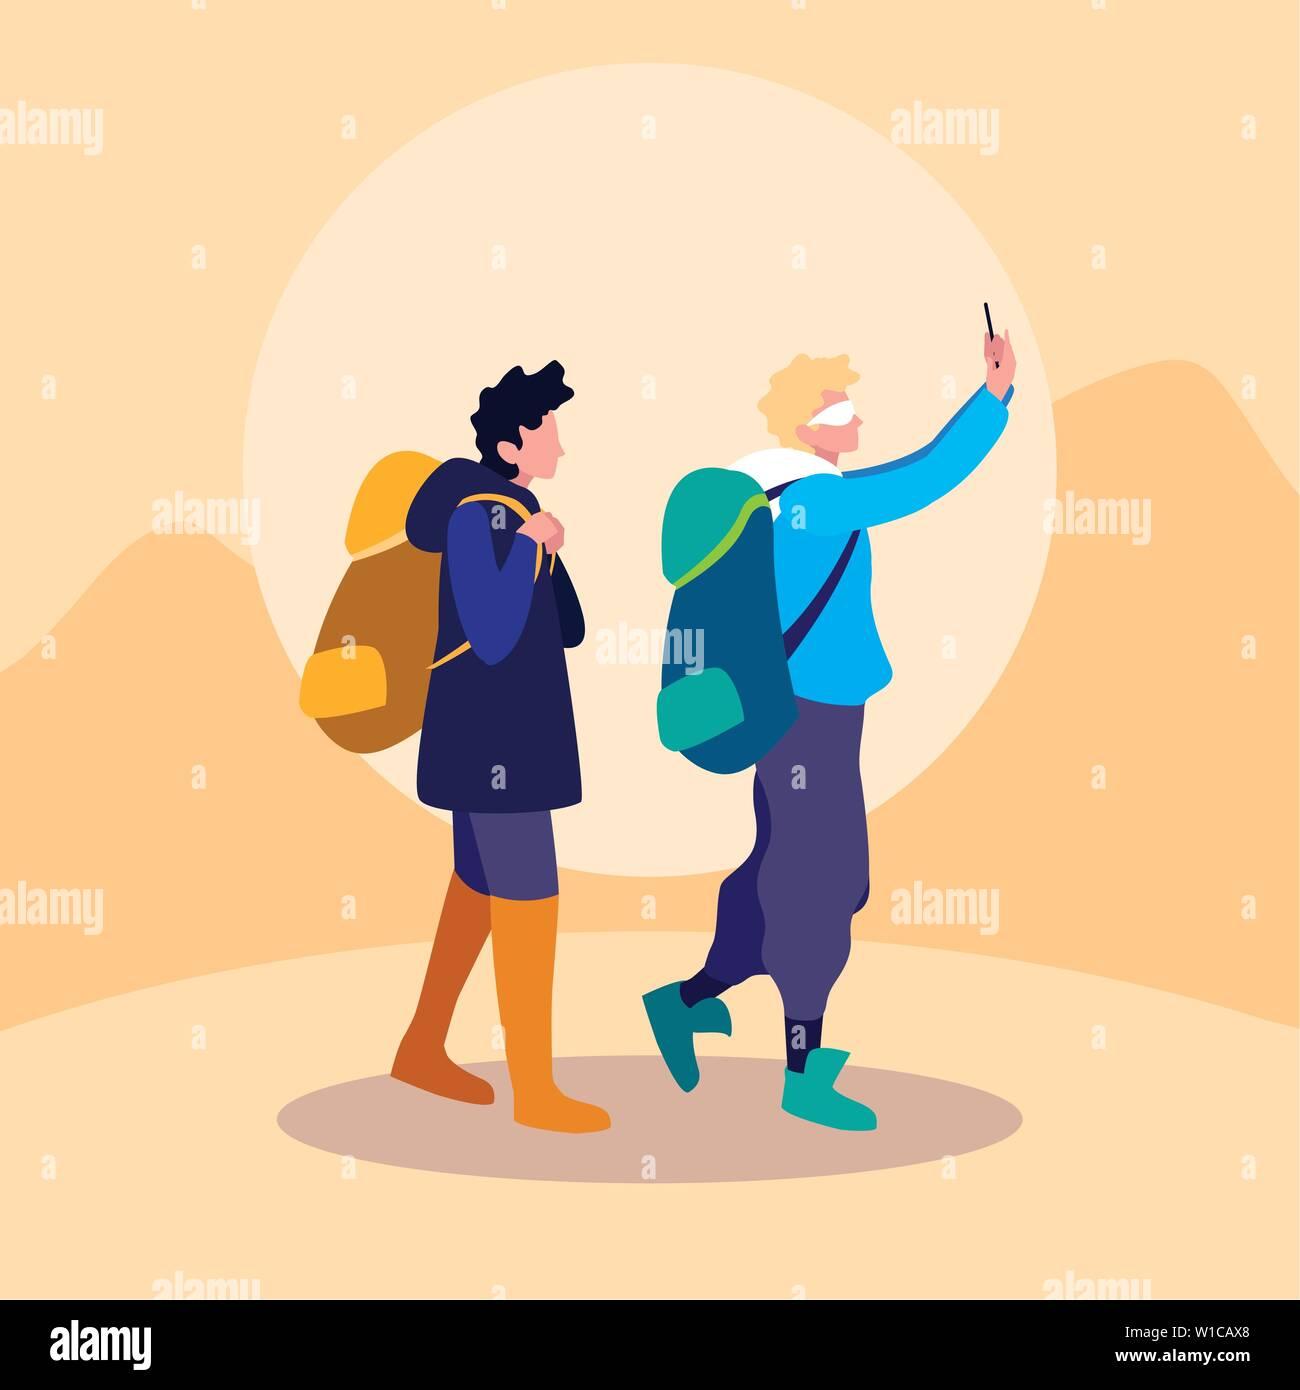 avatar character design young men traveller avatar character vector illustration